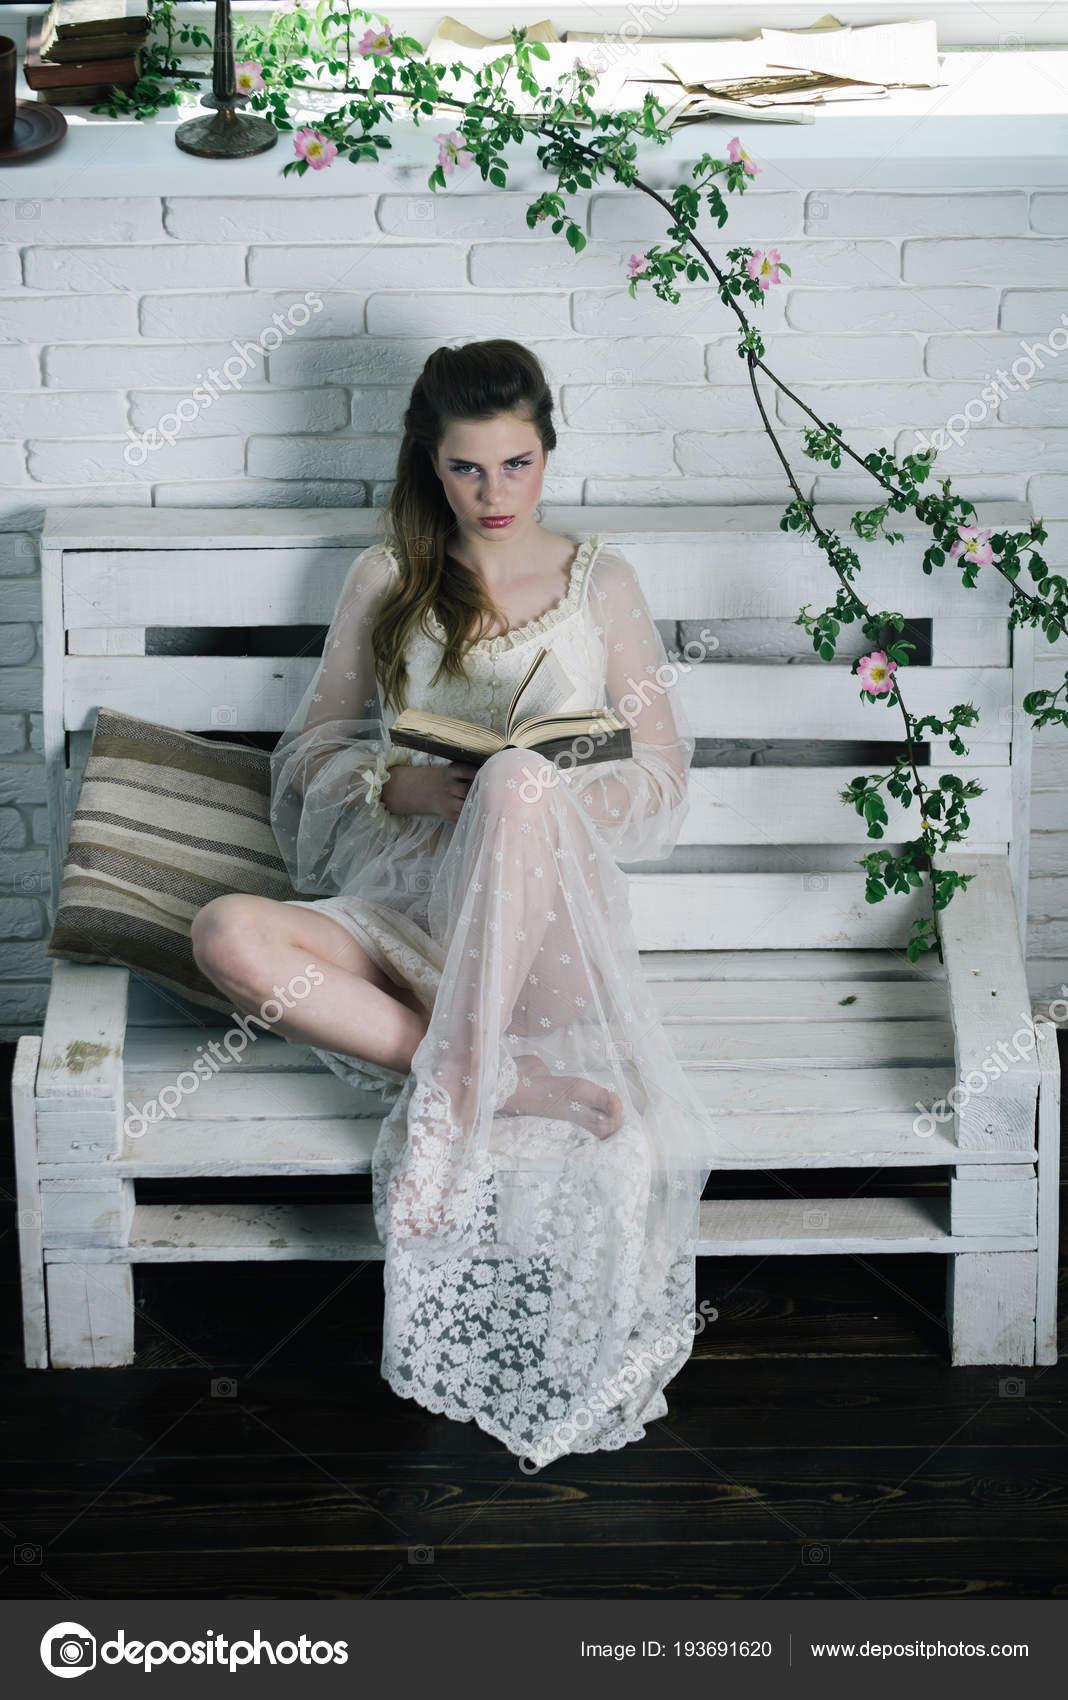 e4cd80296cb Γυναίκα πρότυπο μόδας διαβάσει το βιβλίο. Ομορφιά και τη μόδα Κοιτάξτε σε  στυλ vintage. Ποιητικό βιβλίο ρομαντικό συγγραφέα. Όμορφο κορίτσι σε λευκό  νυφικό ...